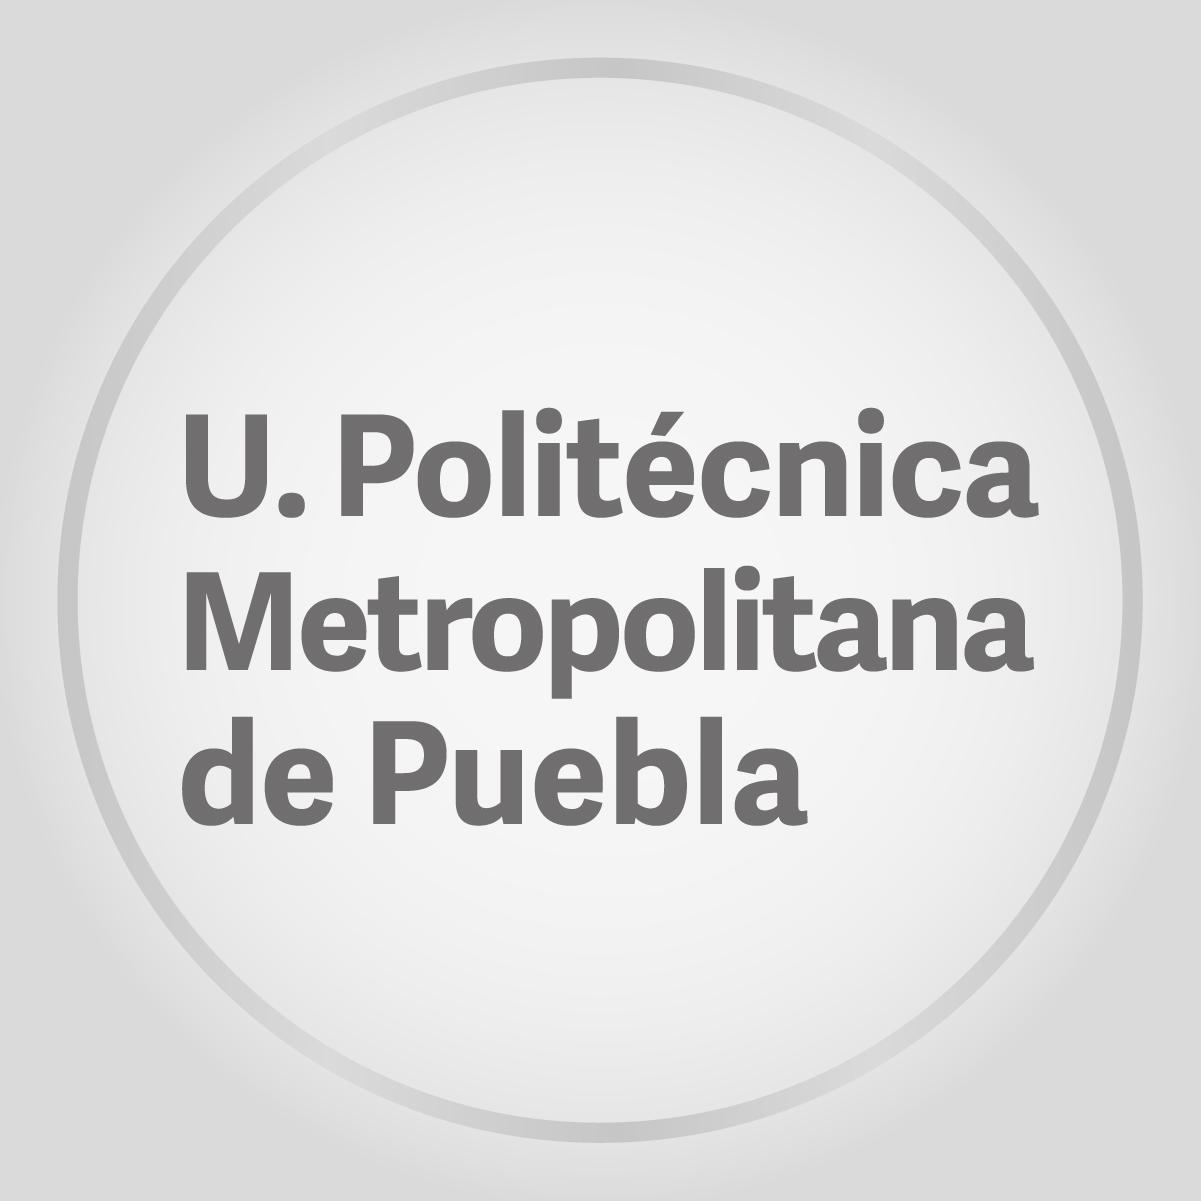 Perfil-_U. Politécnica Metropolitana de Puebla